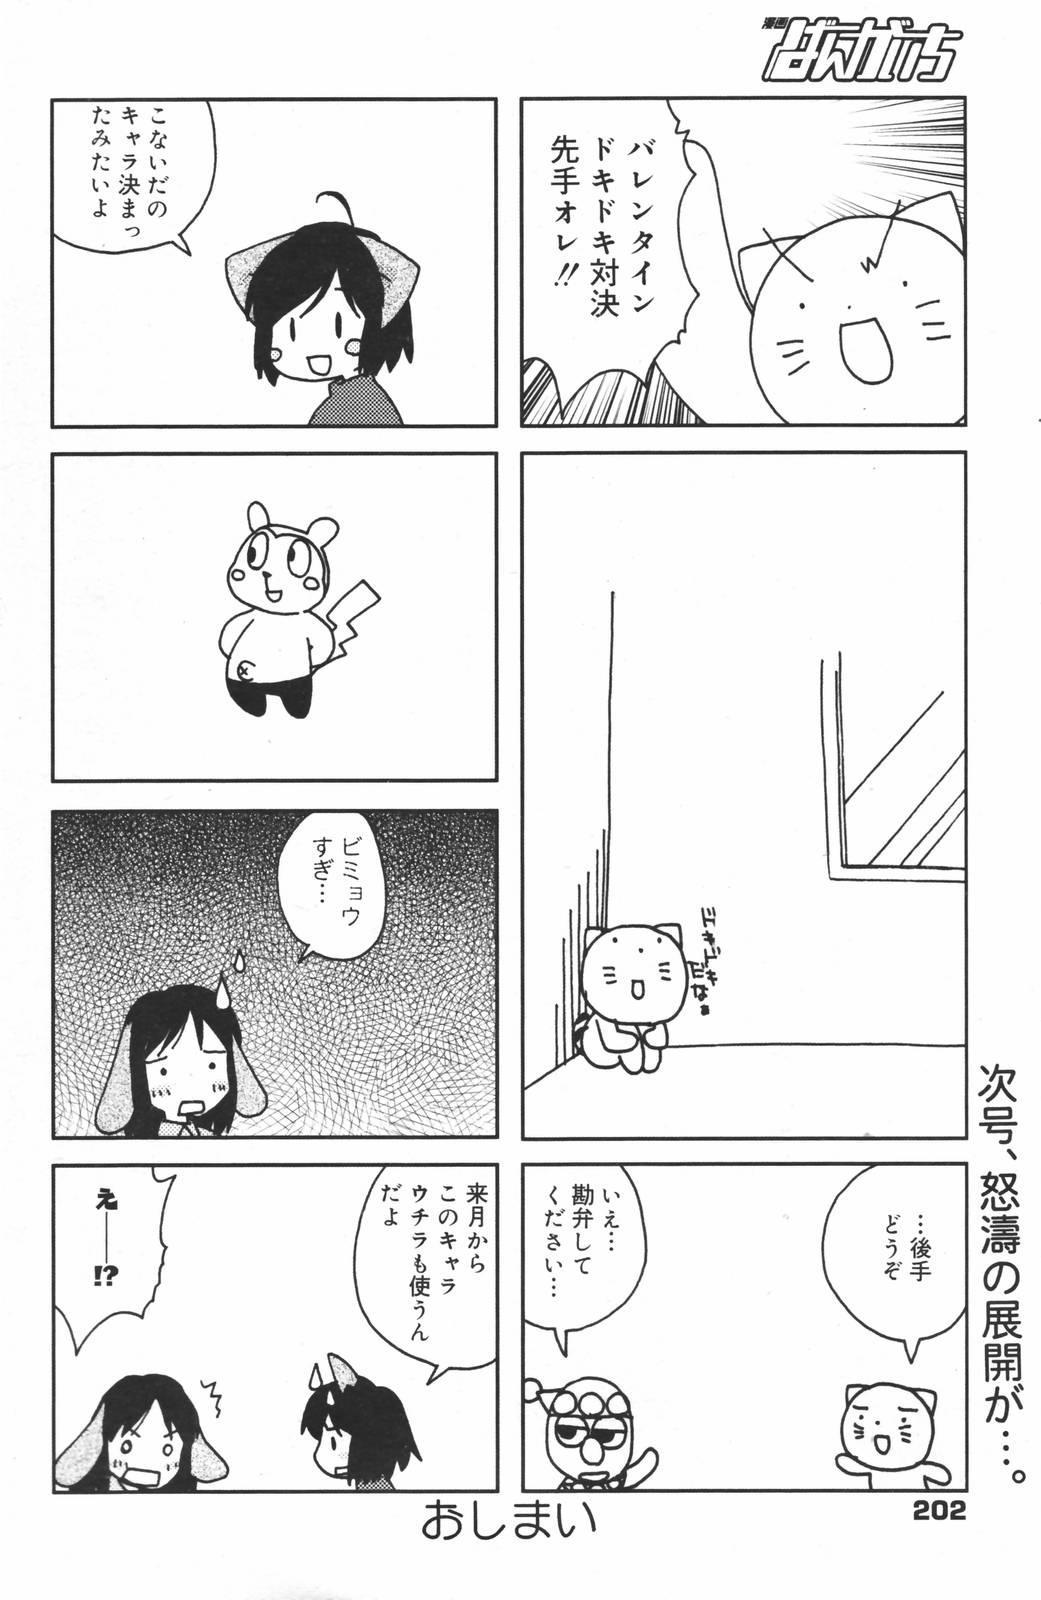 Manga Bangaichi 2007-03 201